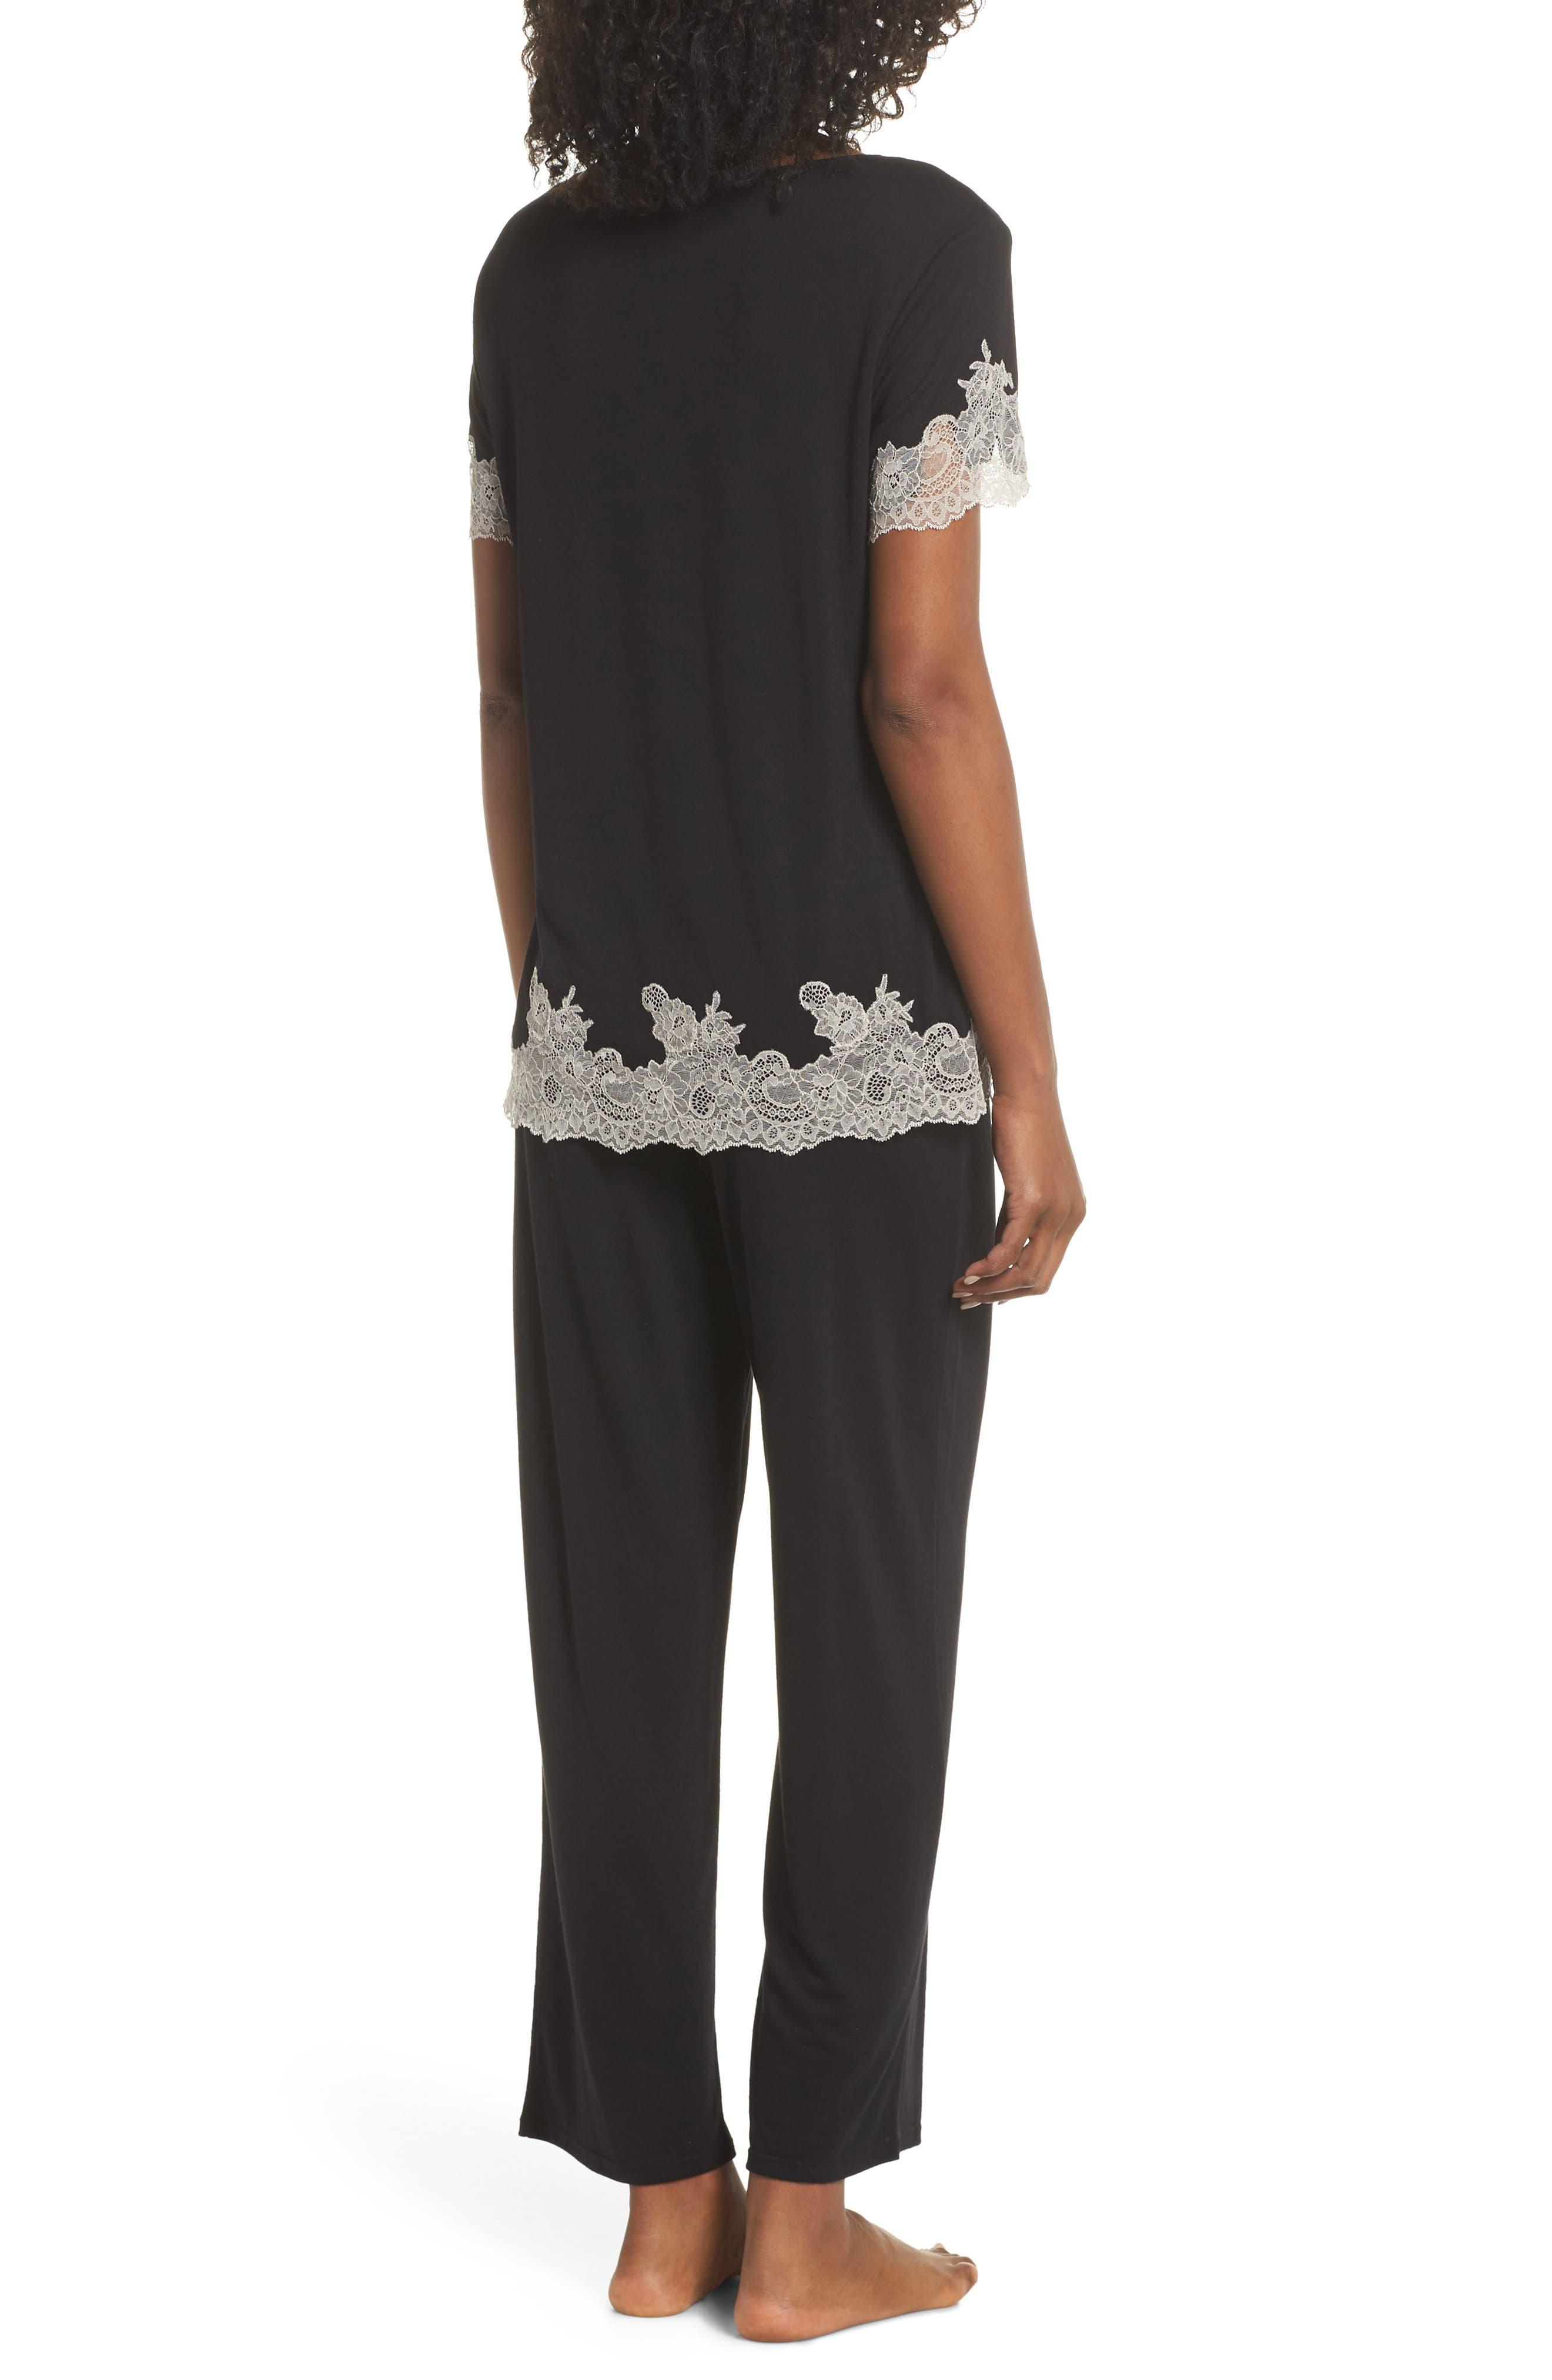 Luxe Shangri-La Pajamas,                             Alternate thumbnail 2, color,                             BLACK/ COCOON